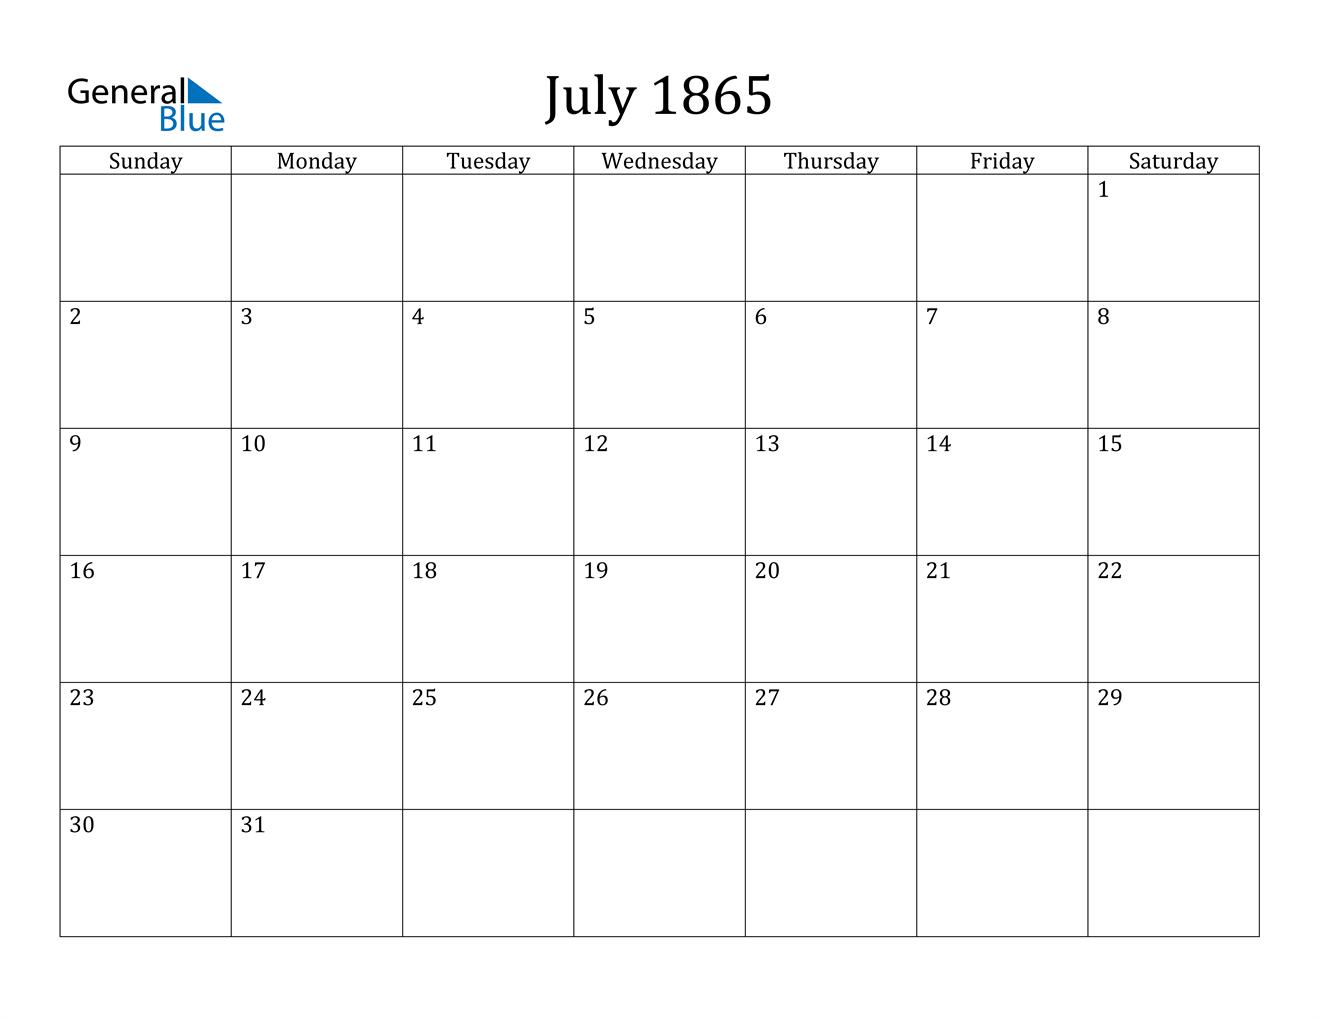 Image of July 1865 Calendar